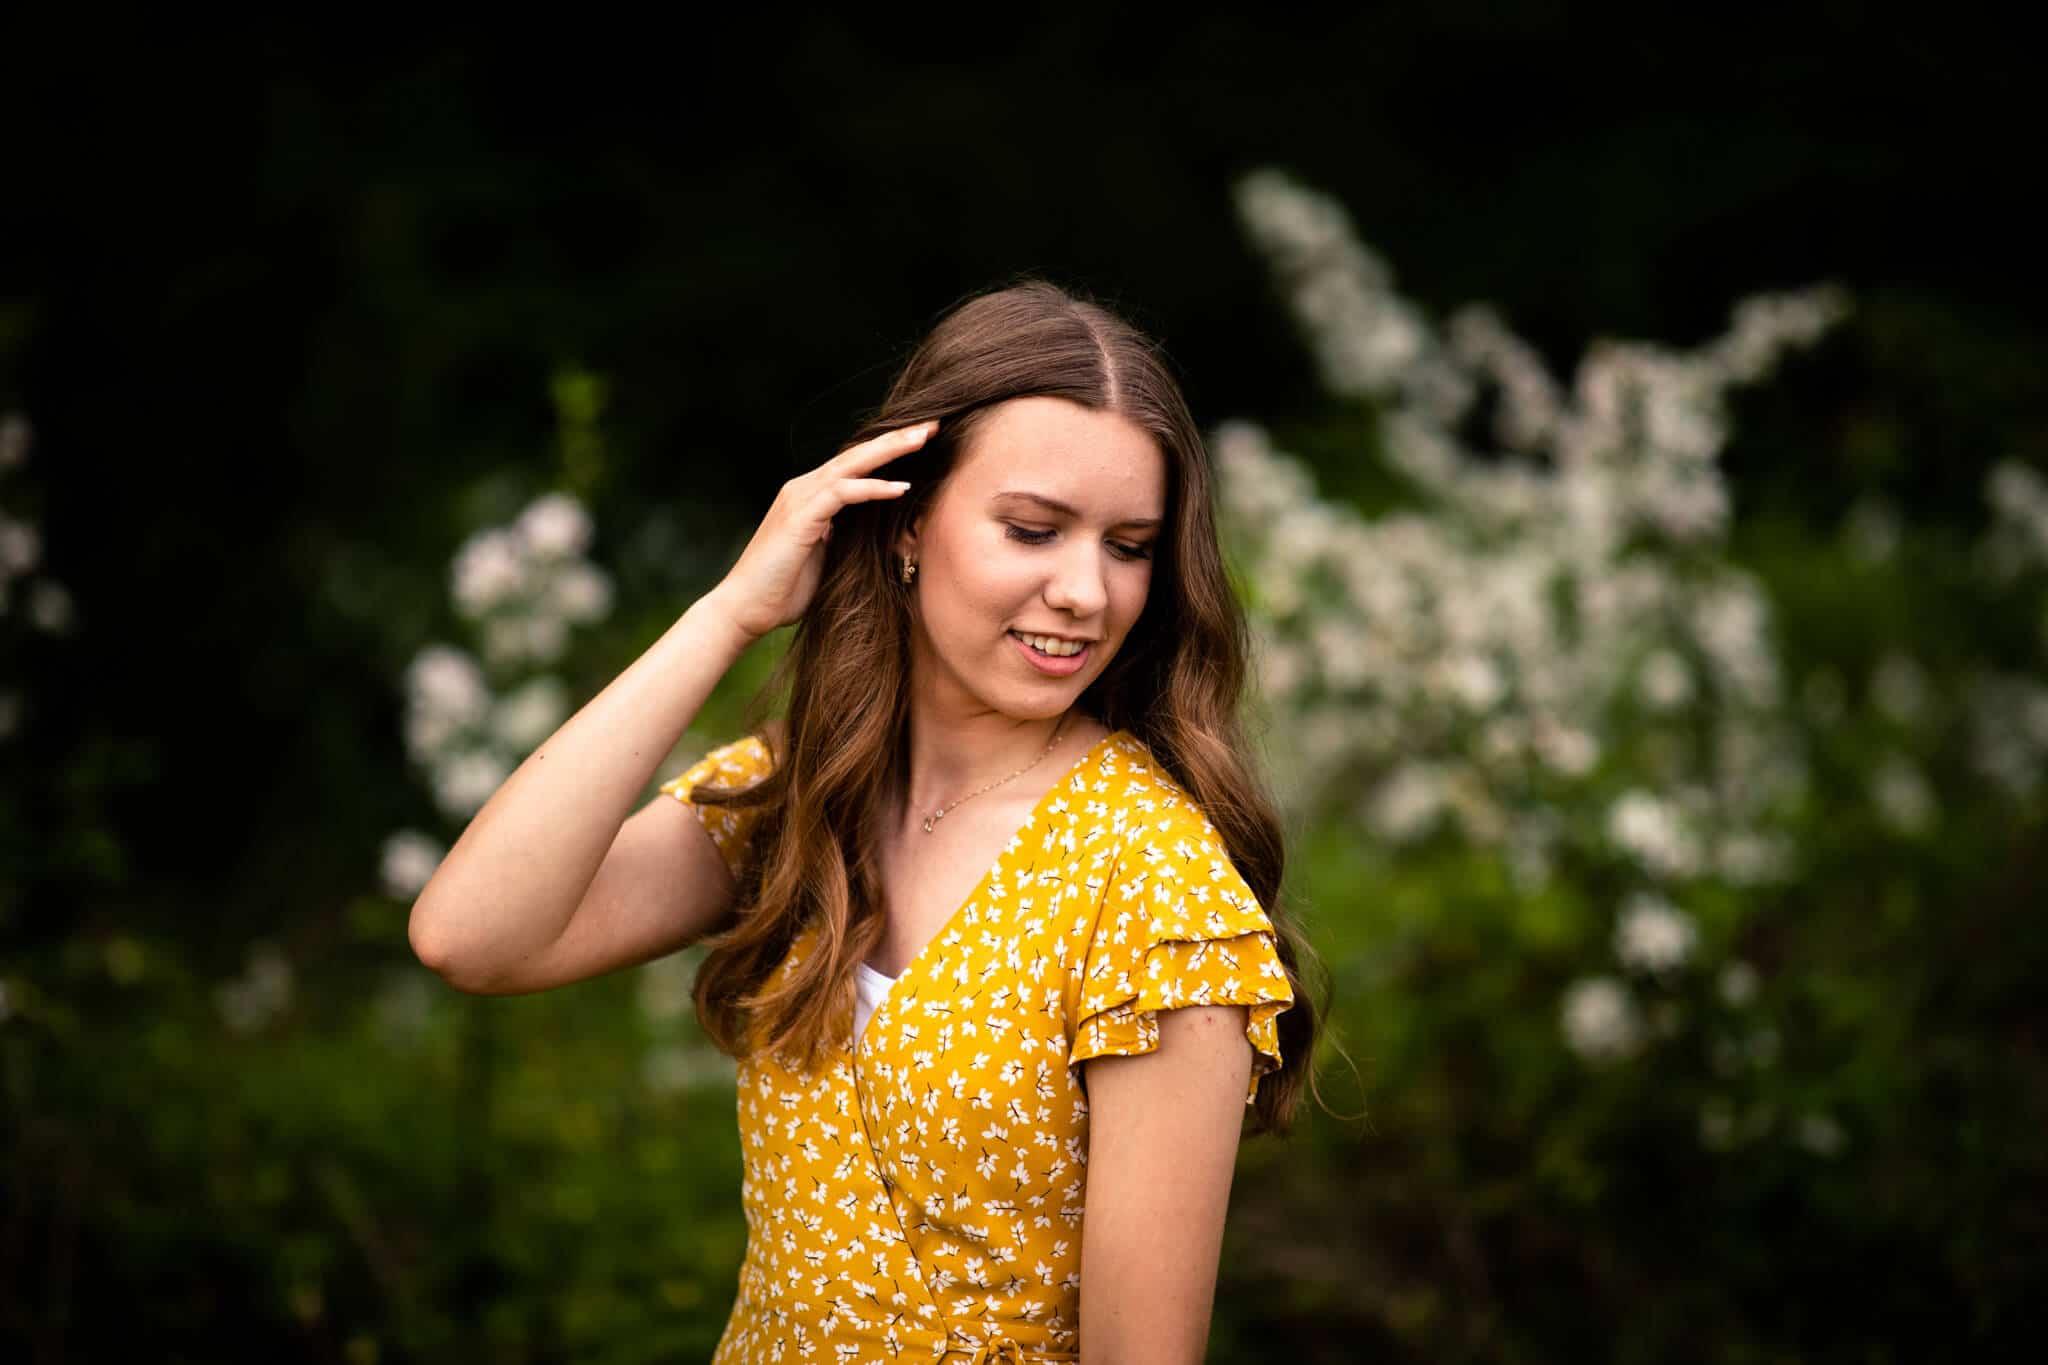 senior girl puts hair behind ear